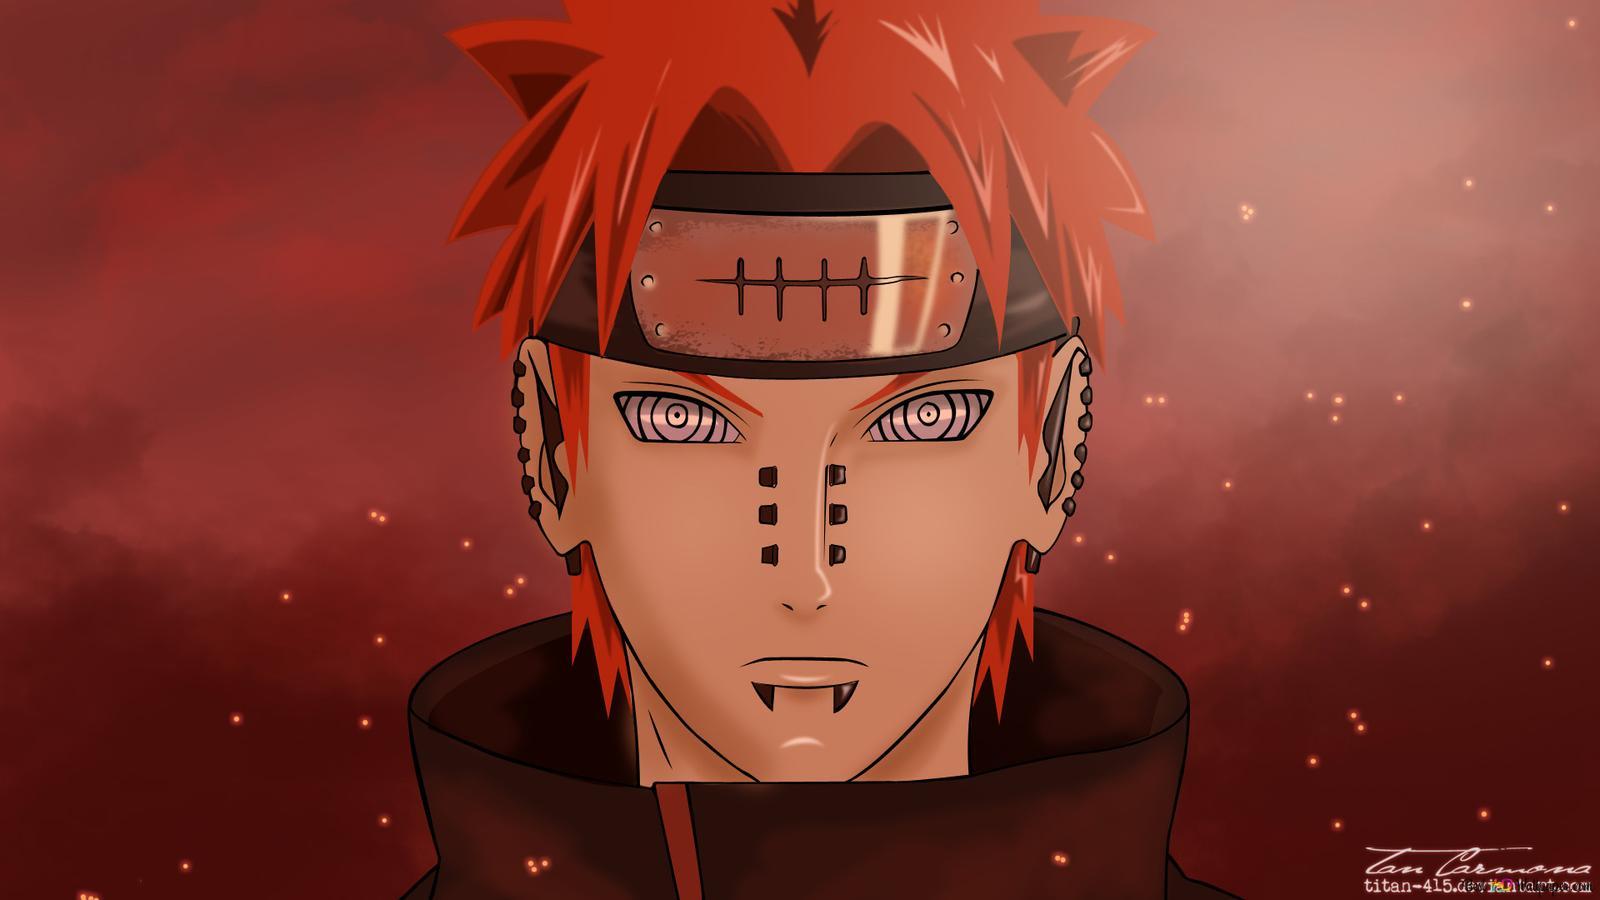 Naruto Shippuden Pain HD Wallpaper